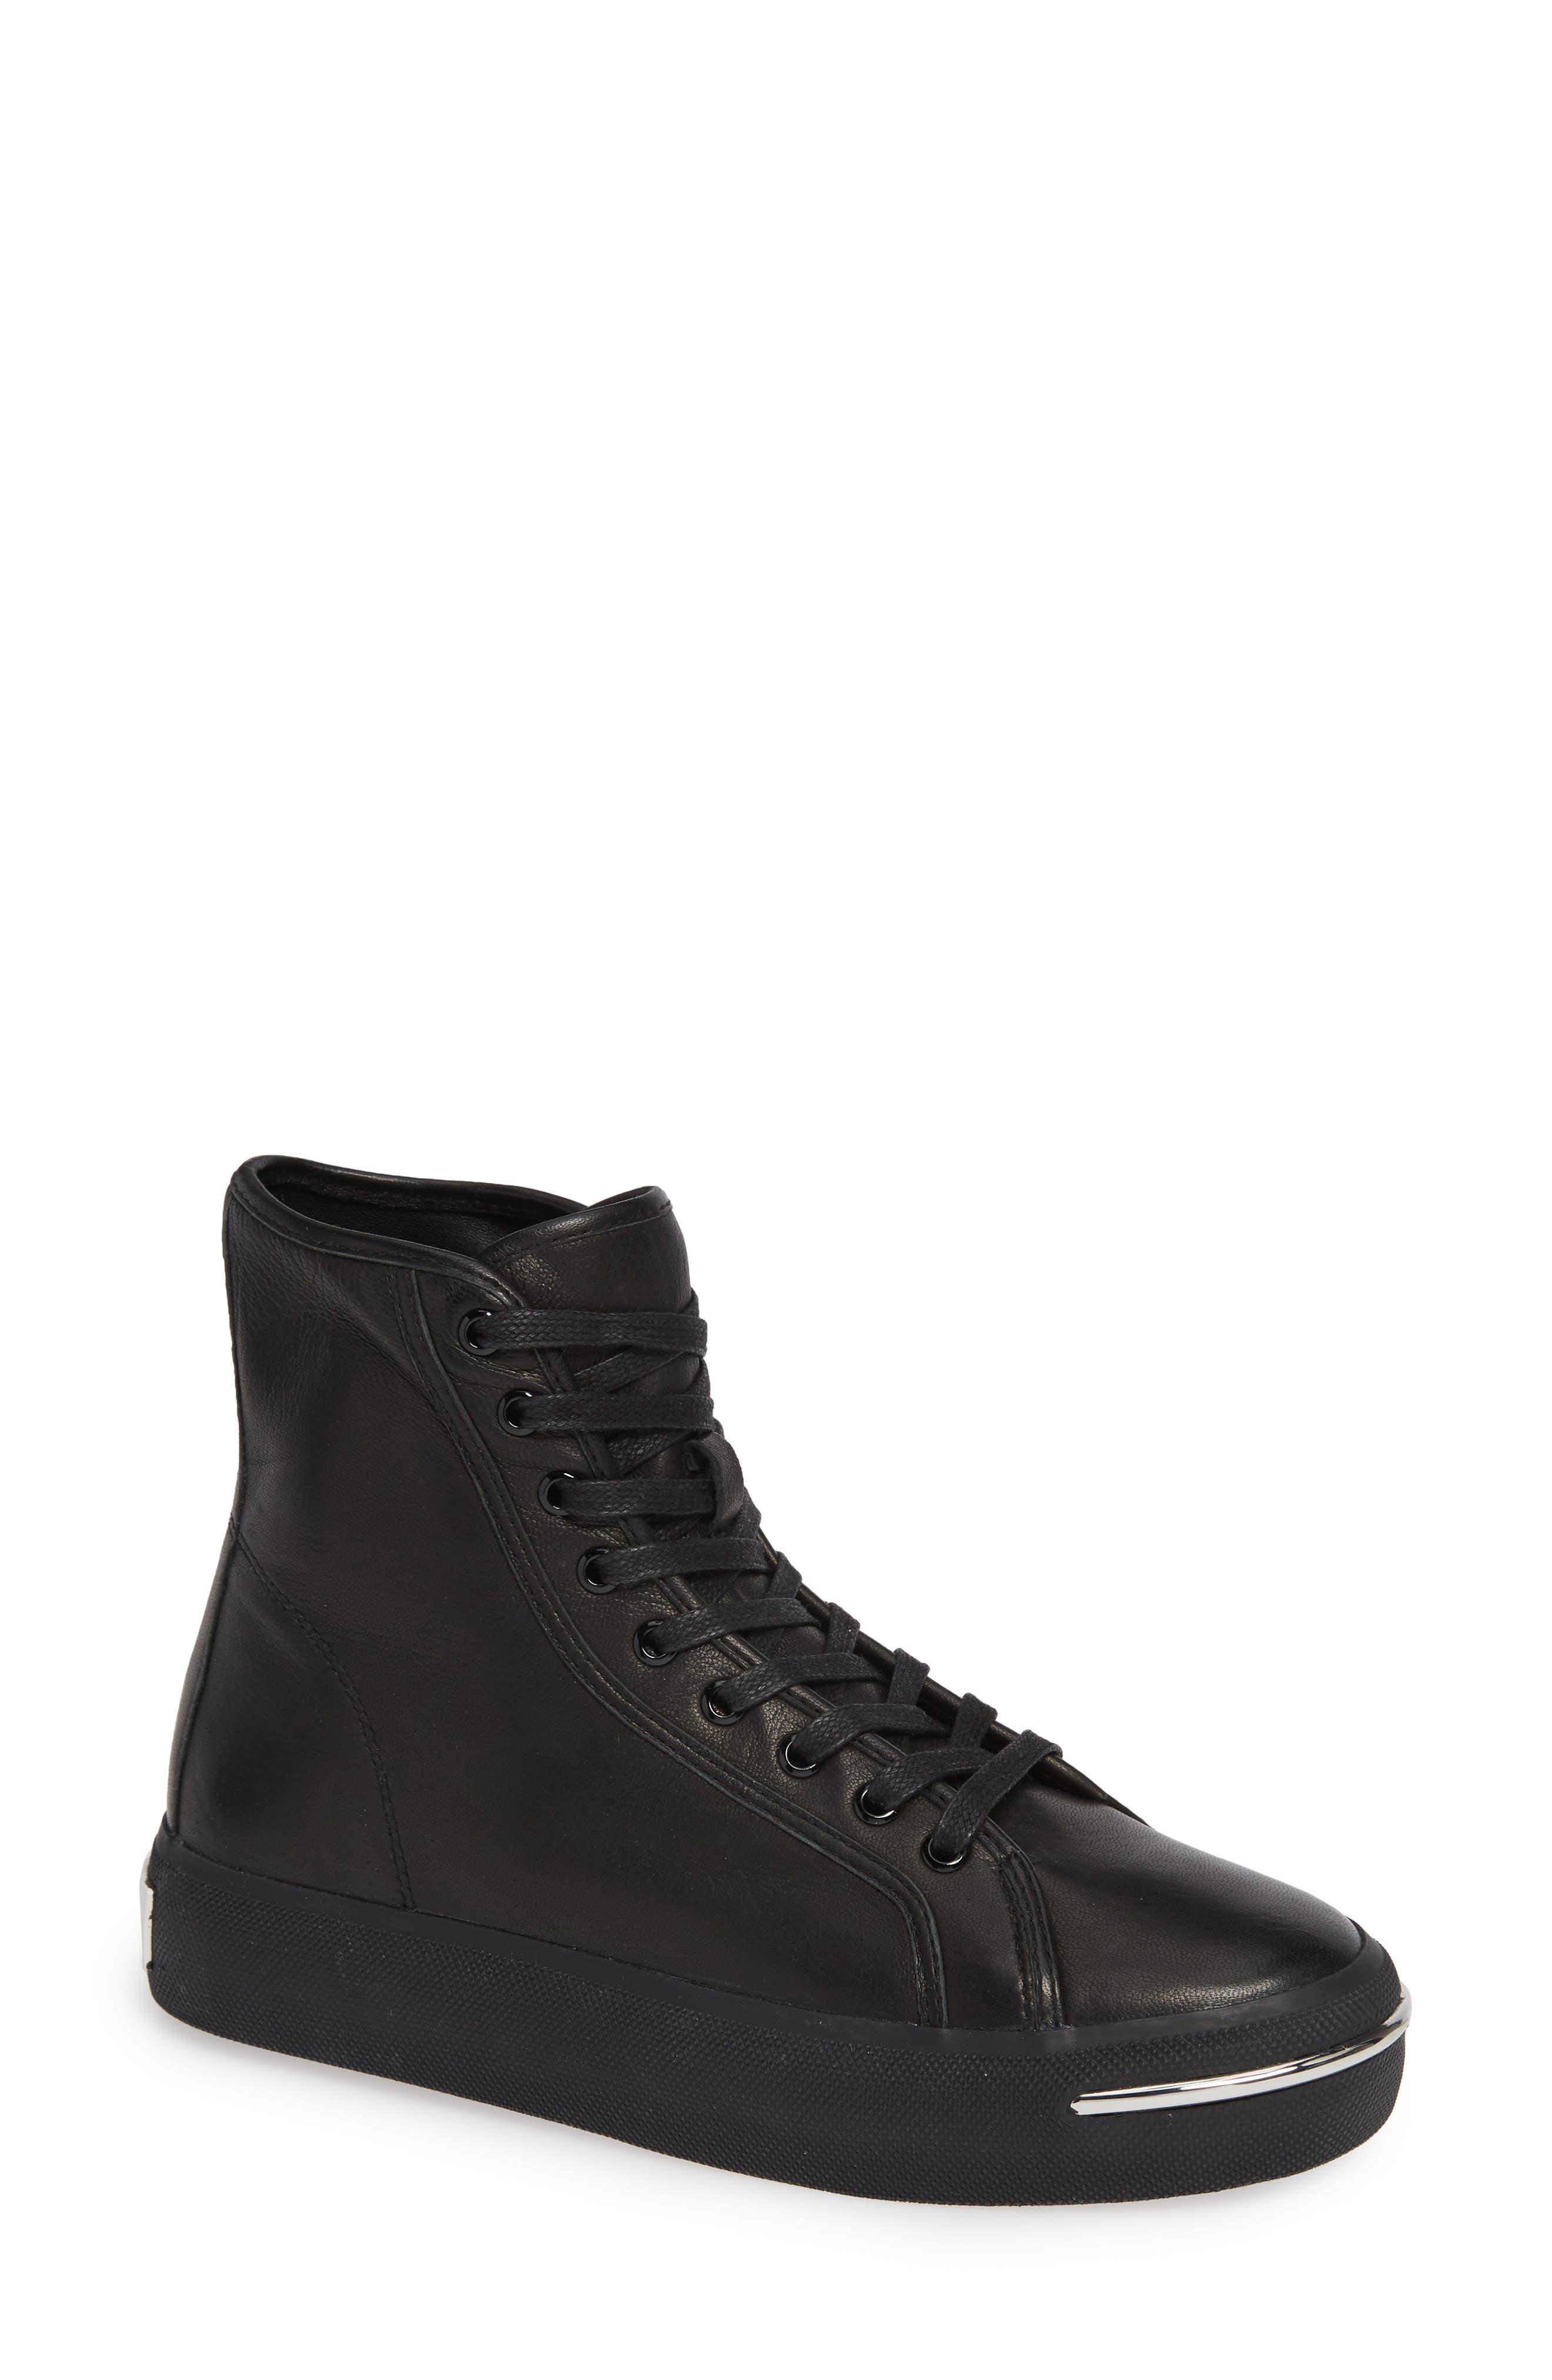 Alexander Wang Pia High Top Sneaker